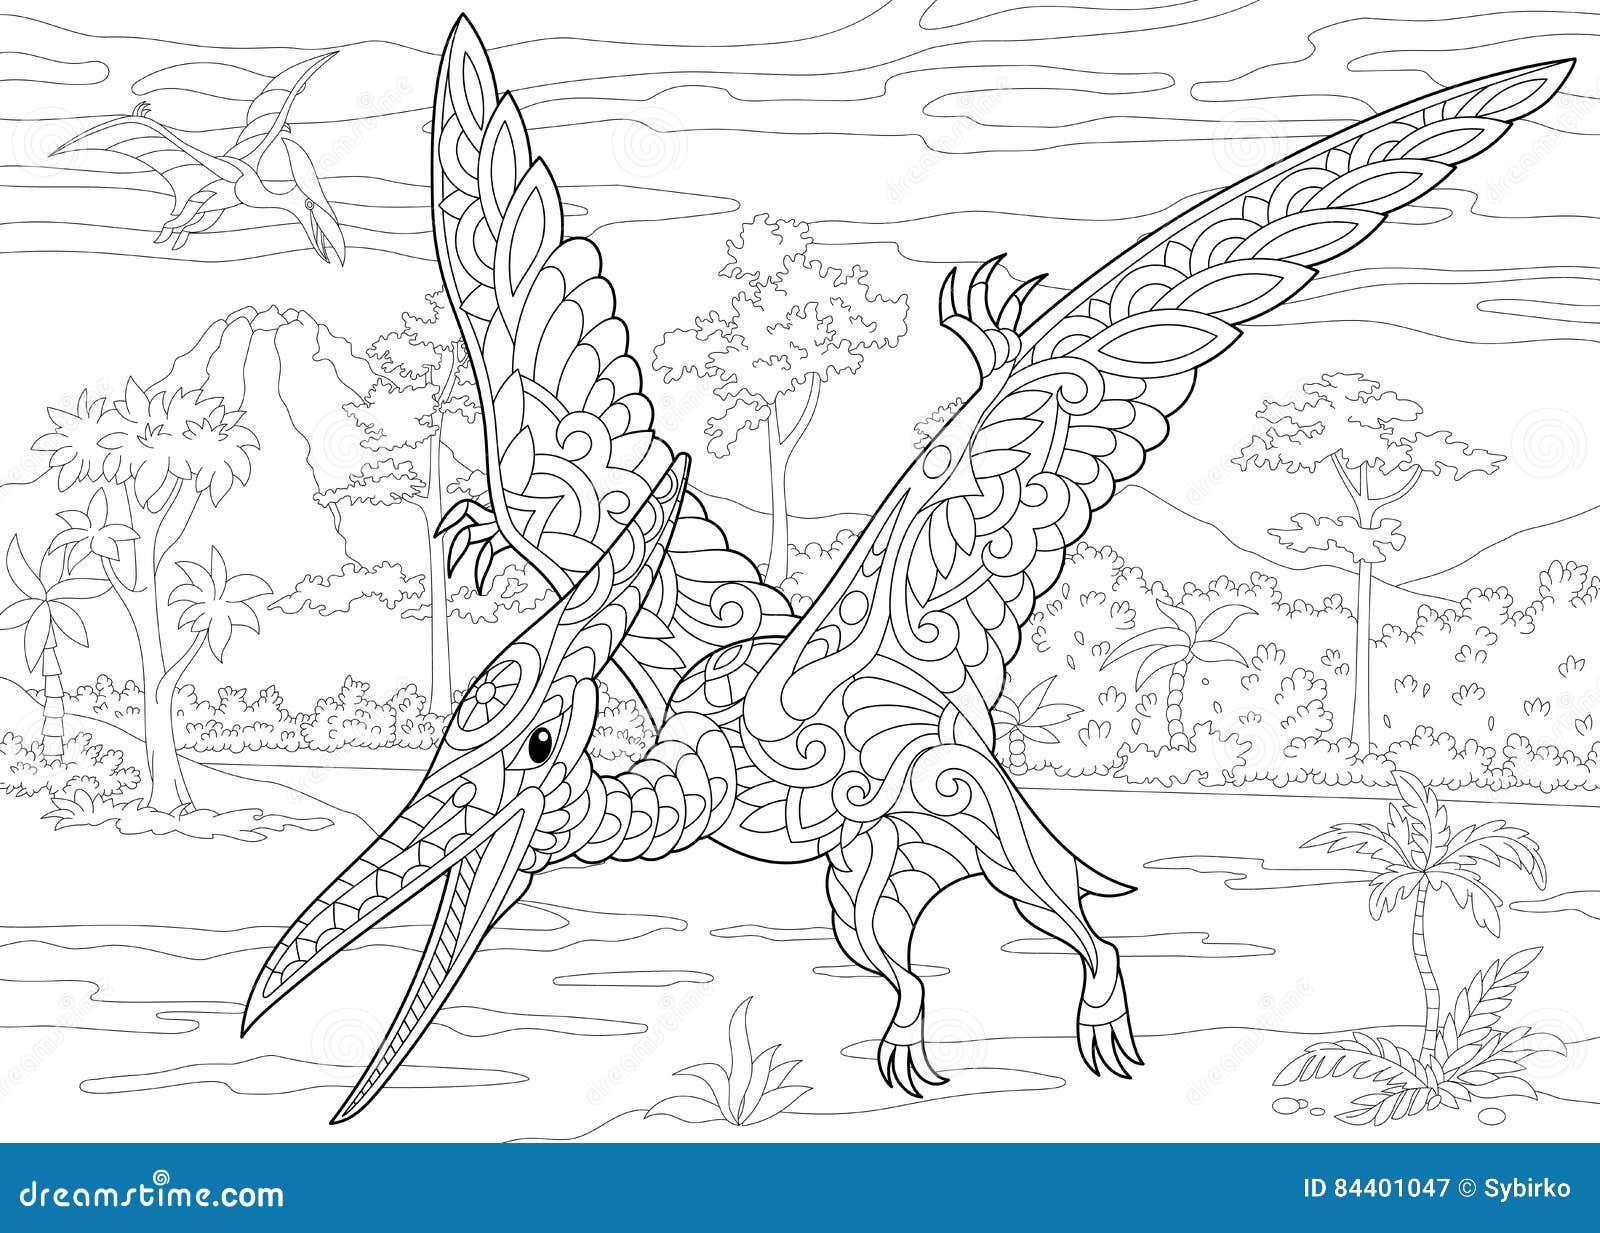 zentanglepterodaktylusdinosaurier vektor abbildung